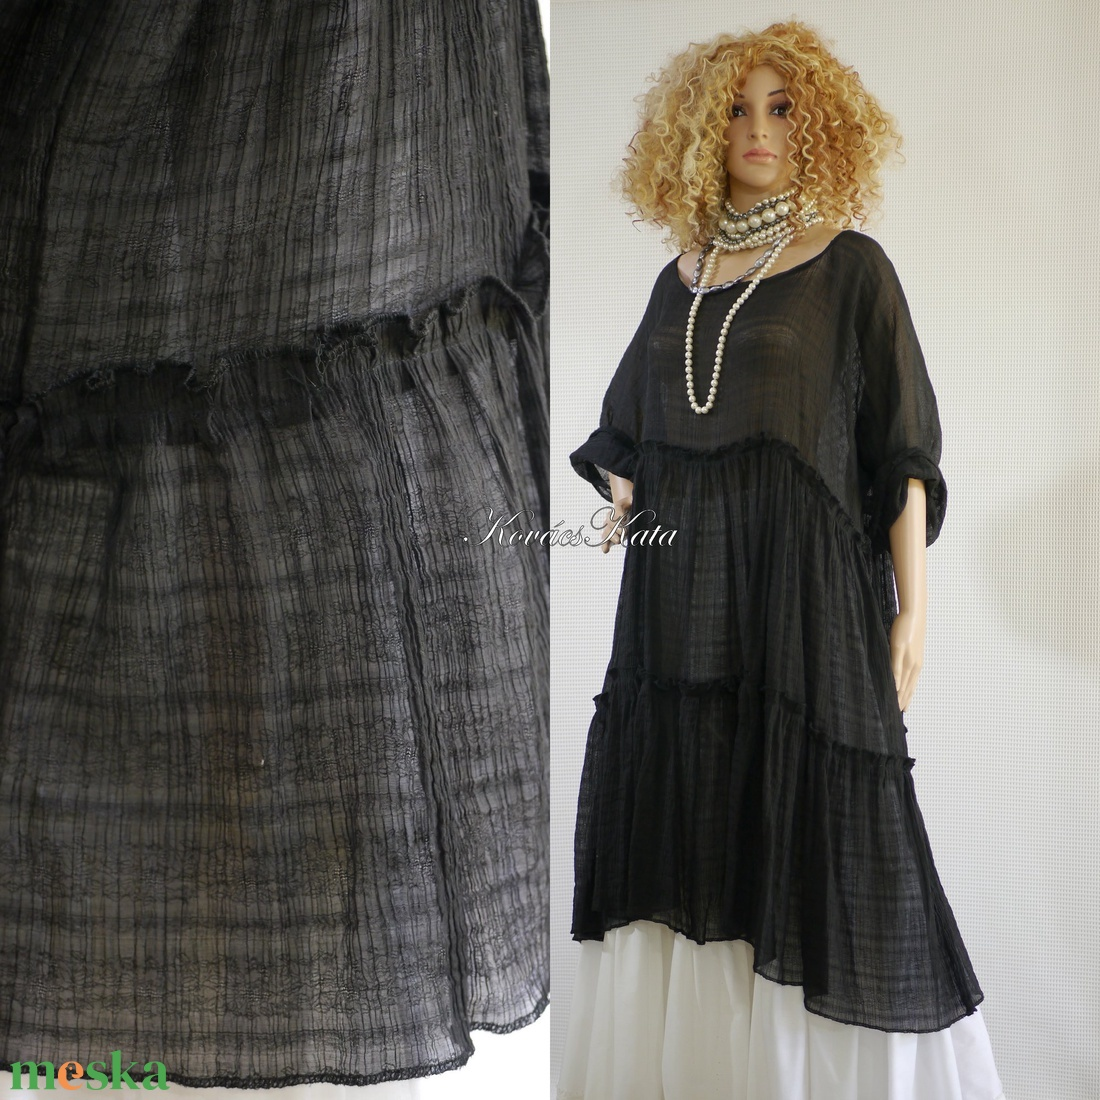 THALIA - romantikus lagenlook ruha XXL - ruha & divat - női ruha - alkalmi ruha & estélyi ruha - Meska.hu